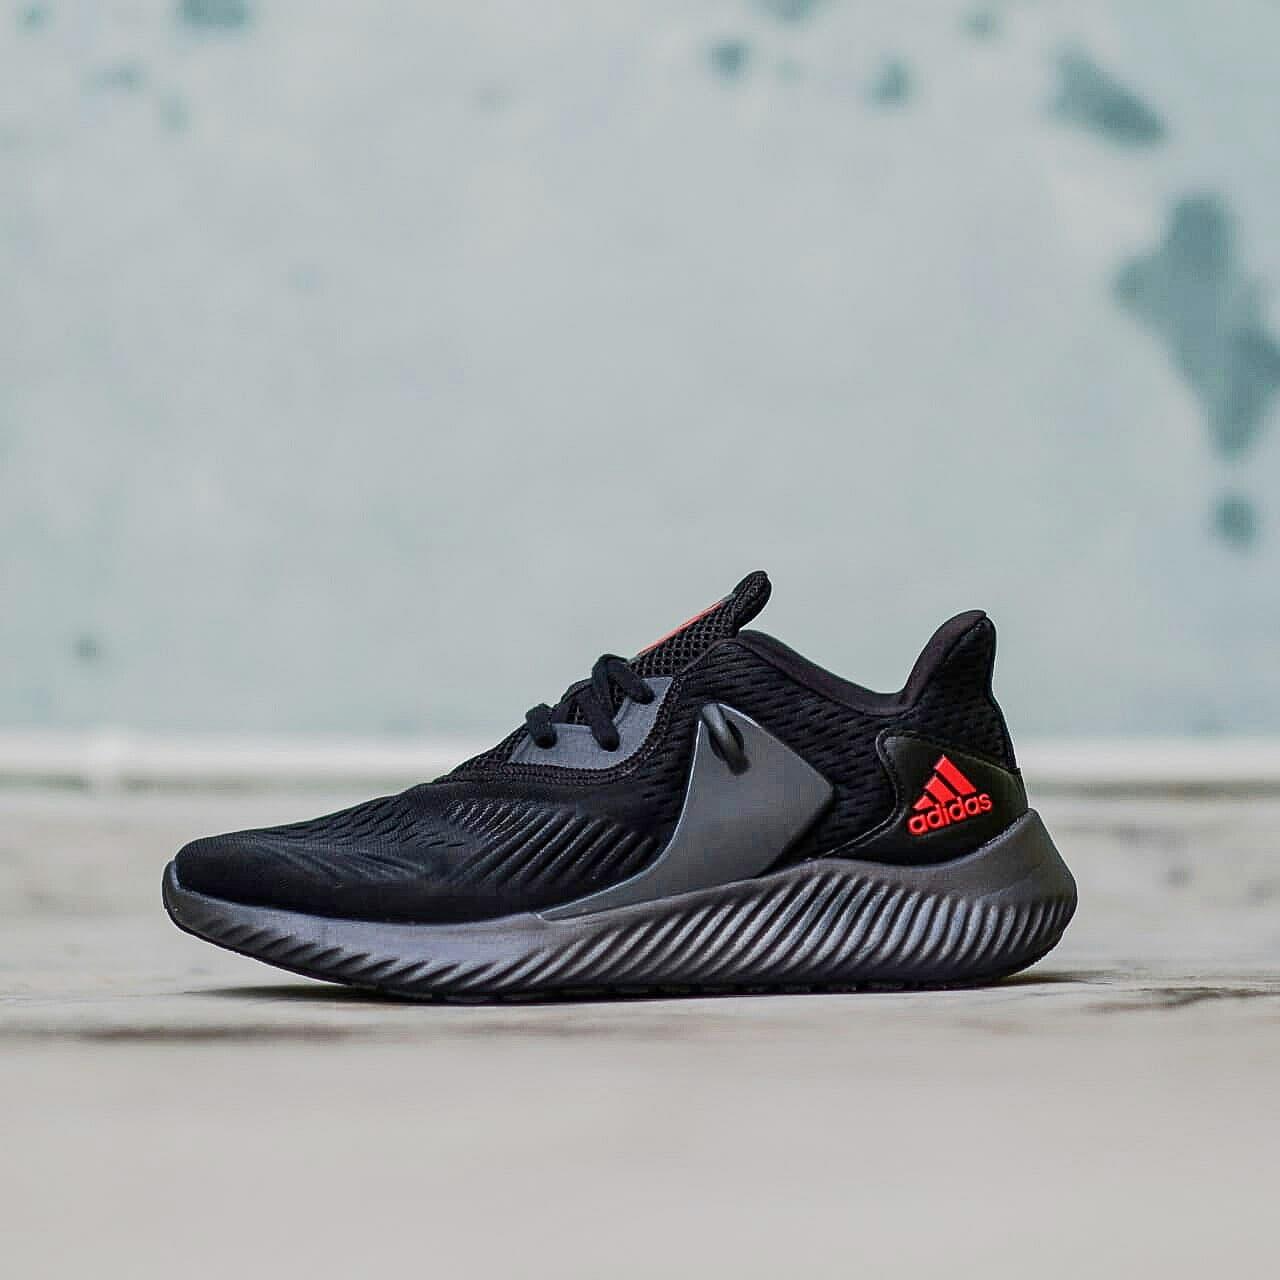 5c38370f Jual Sepatu Adidas ALPHABOUNCE Original Made In Indonesia BNWB